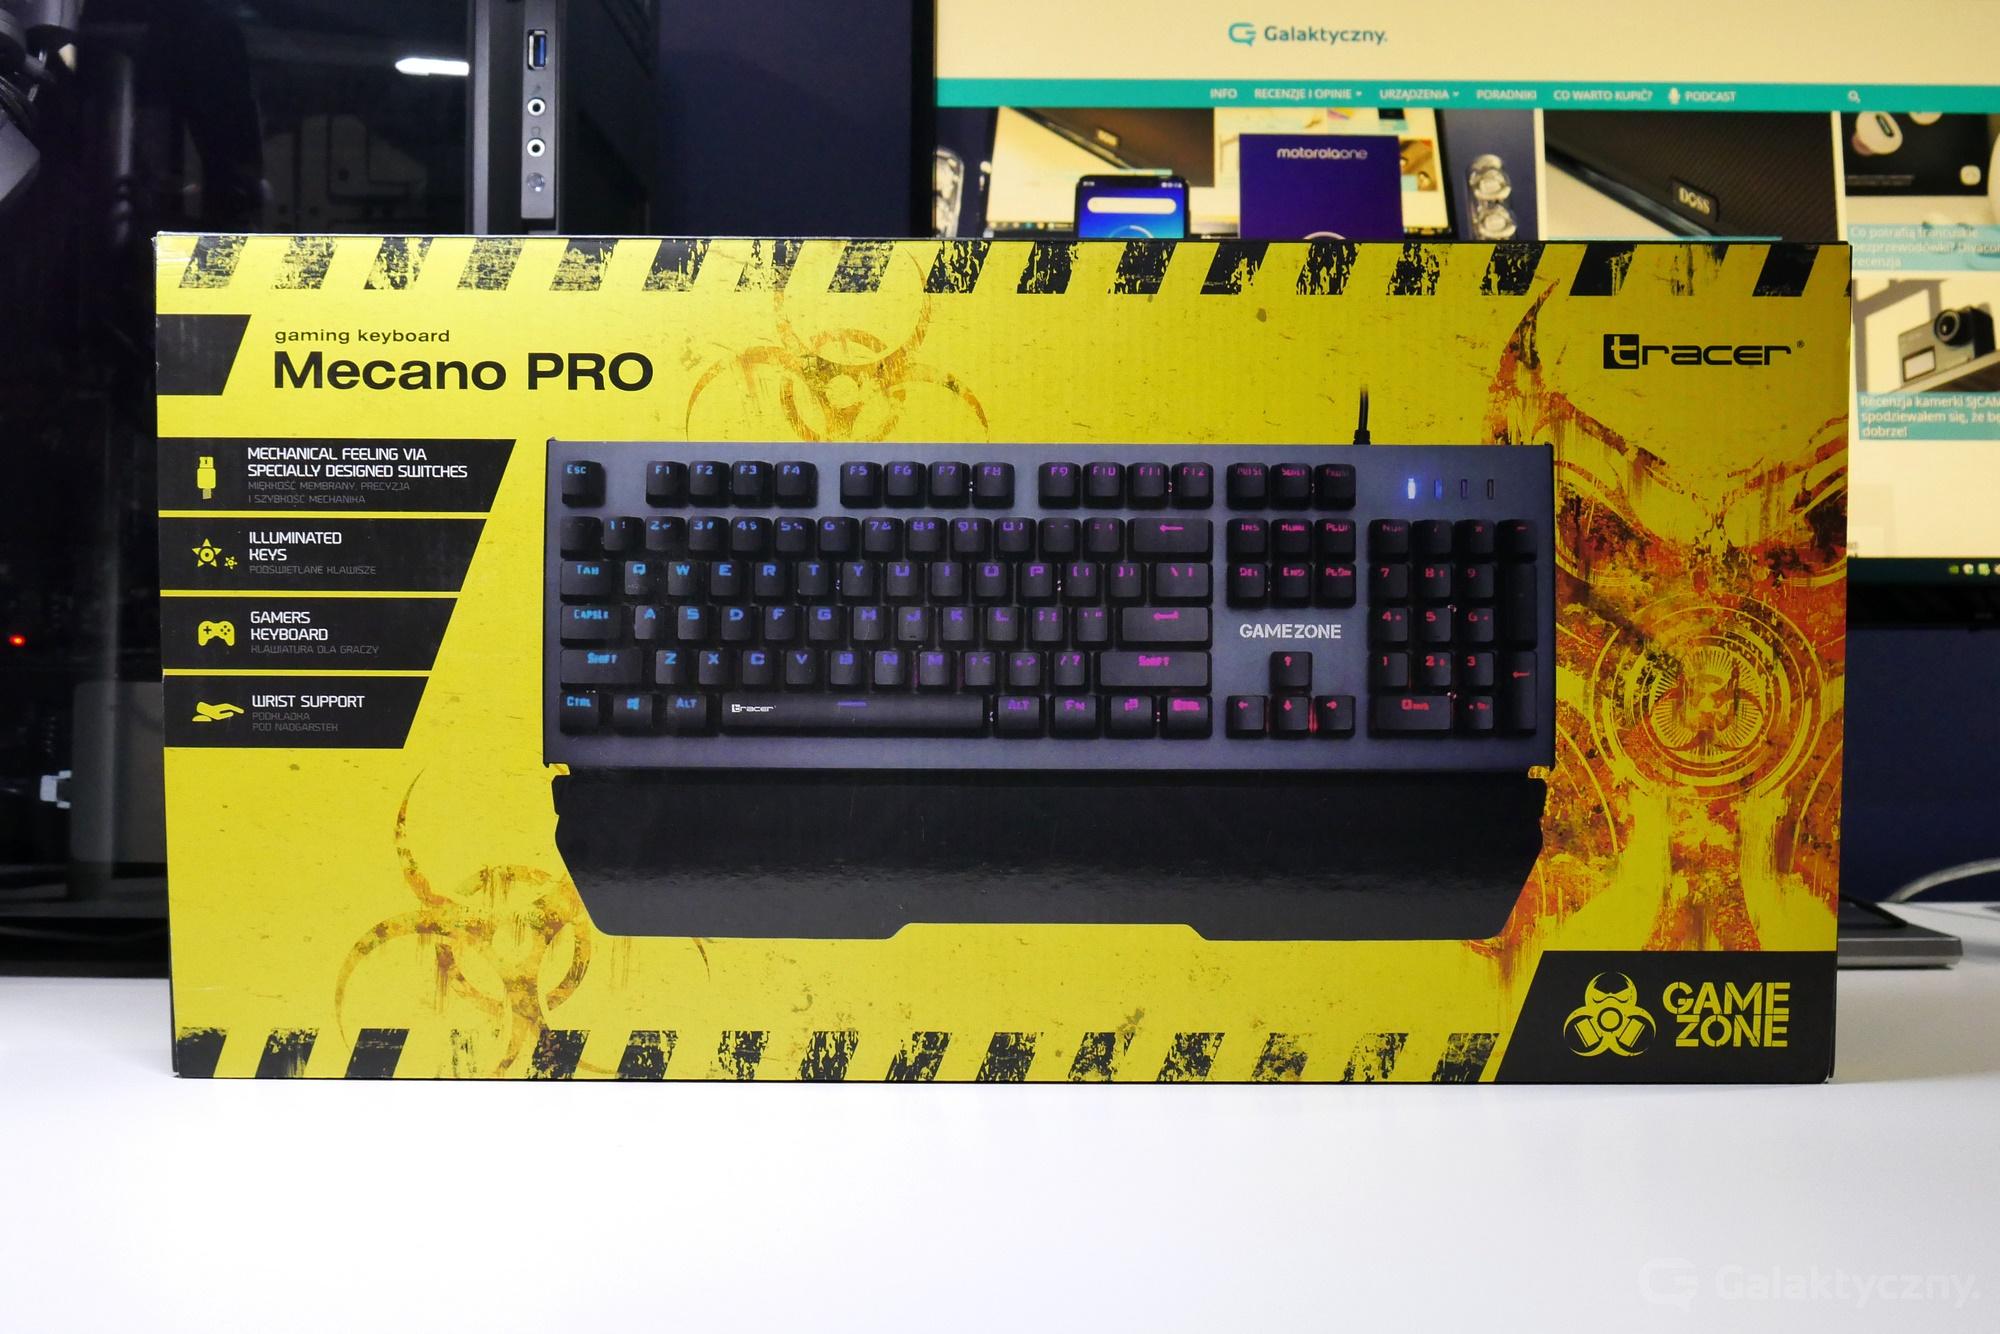 Tracer Gamezone Mecano Pro